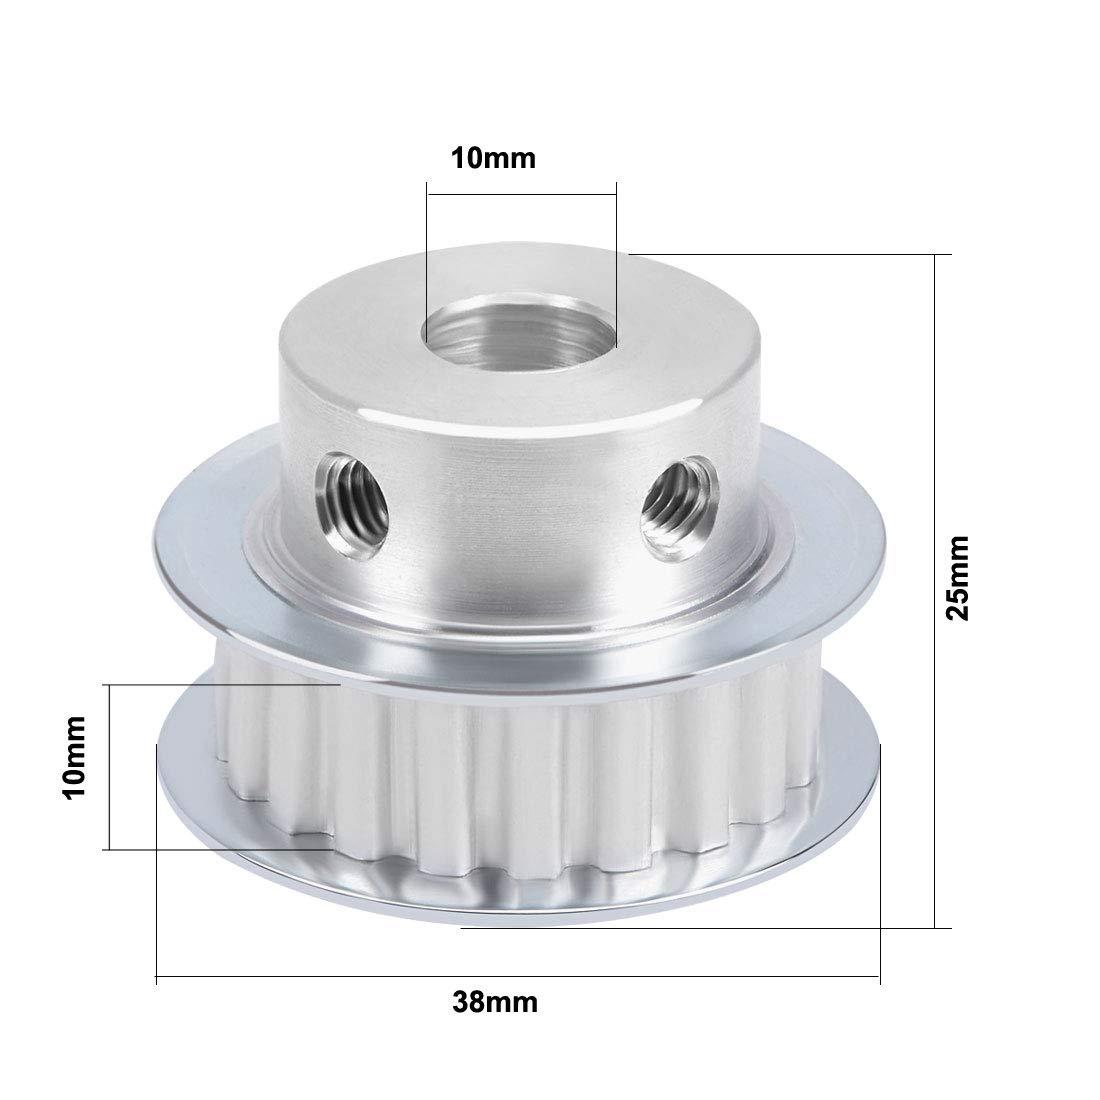 sourcing map Aluminio XL 20 Dientes 10mm diámetro Polea de Correa ...